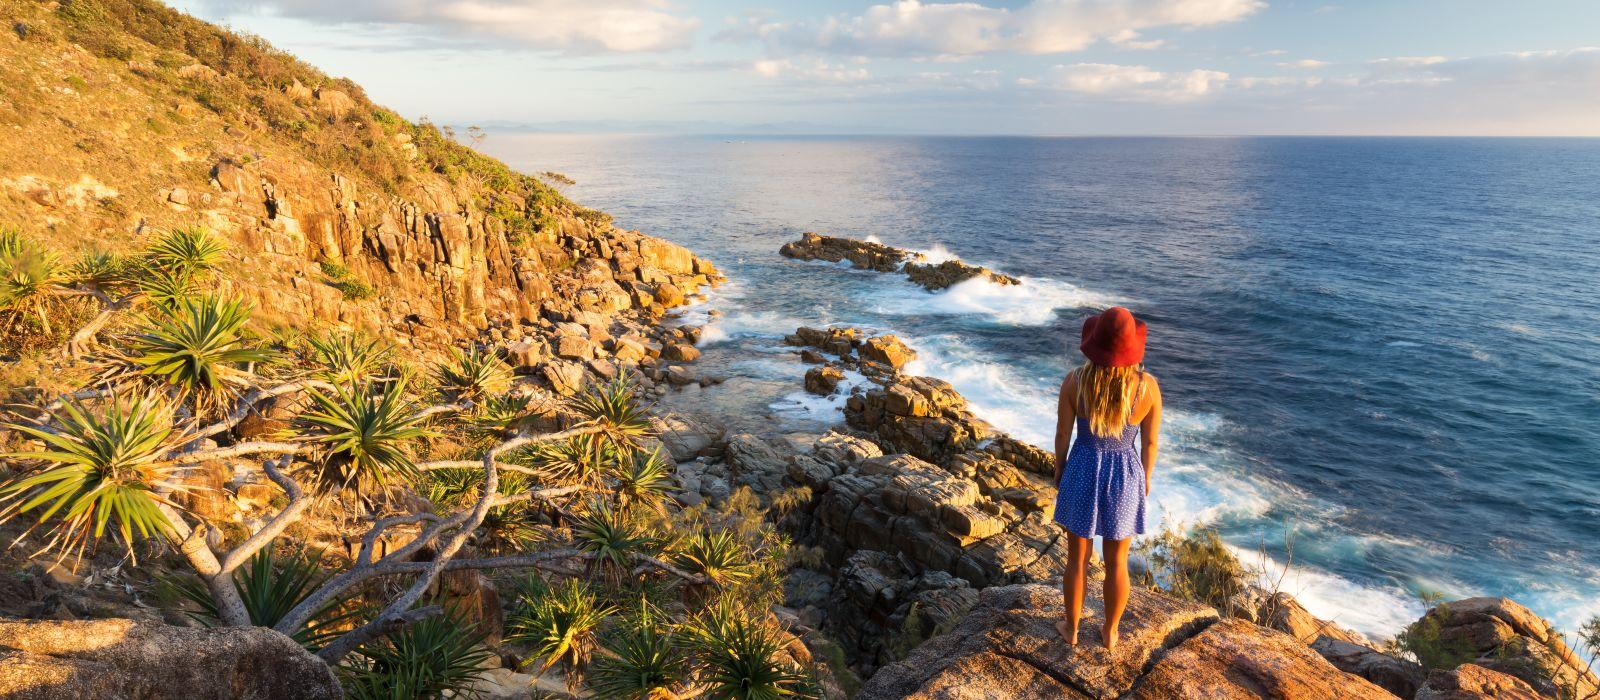 Reiseziel Coffs Harbour Australien